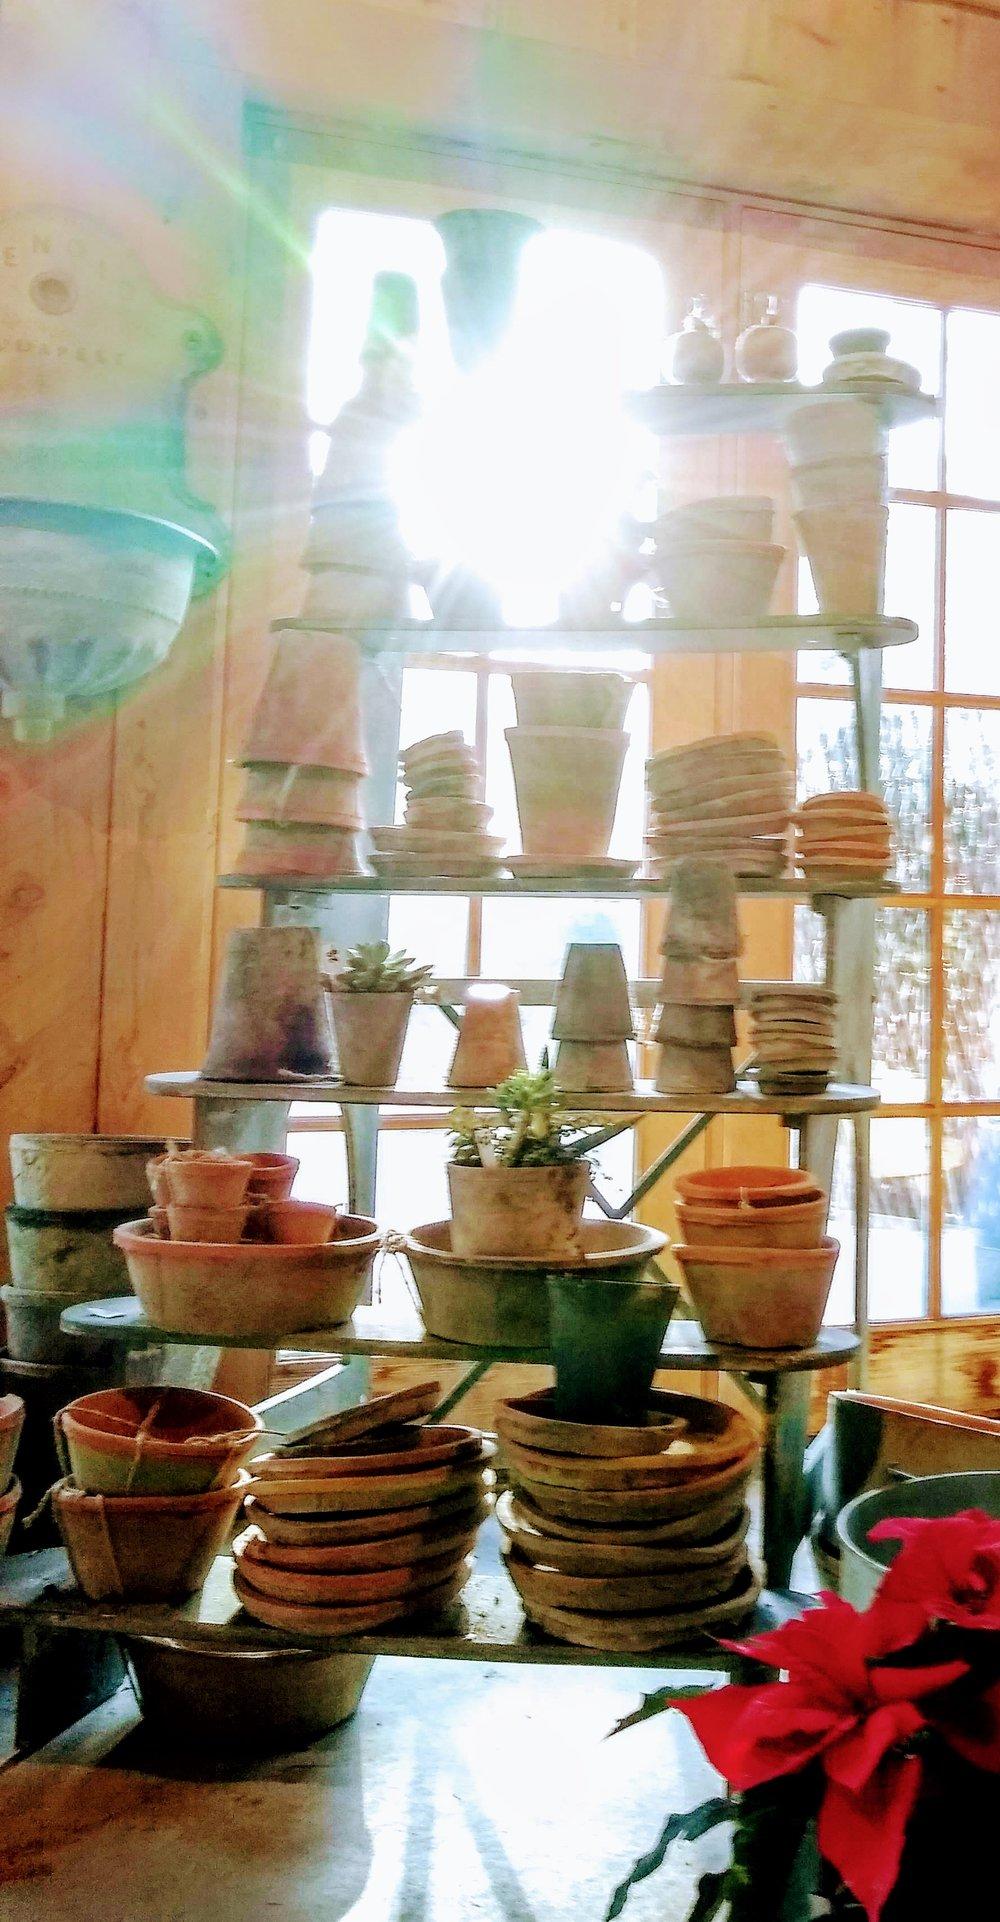 Herbary-Pots.jpg